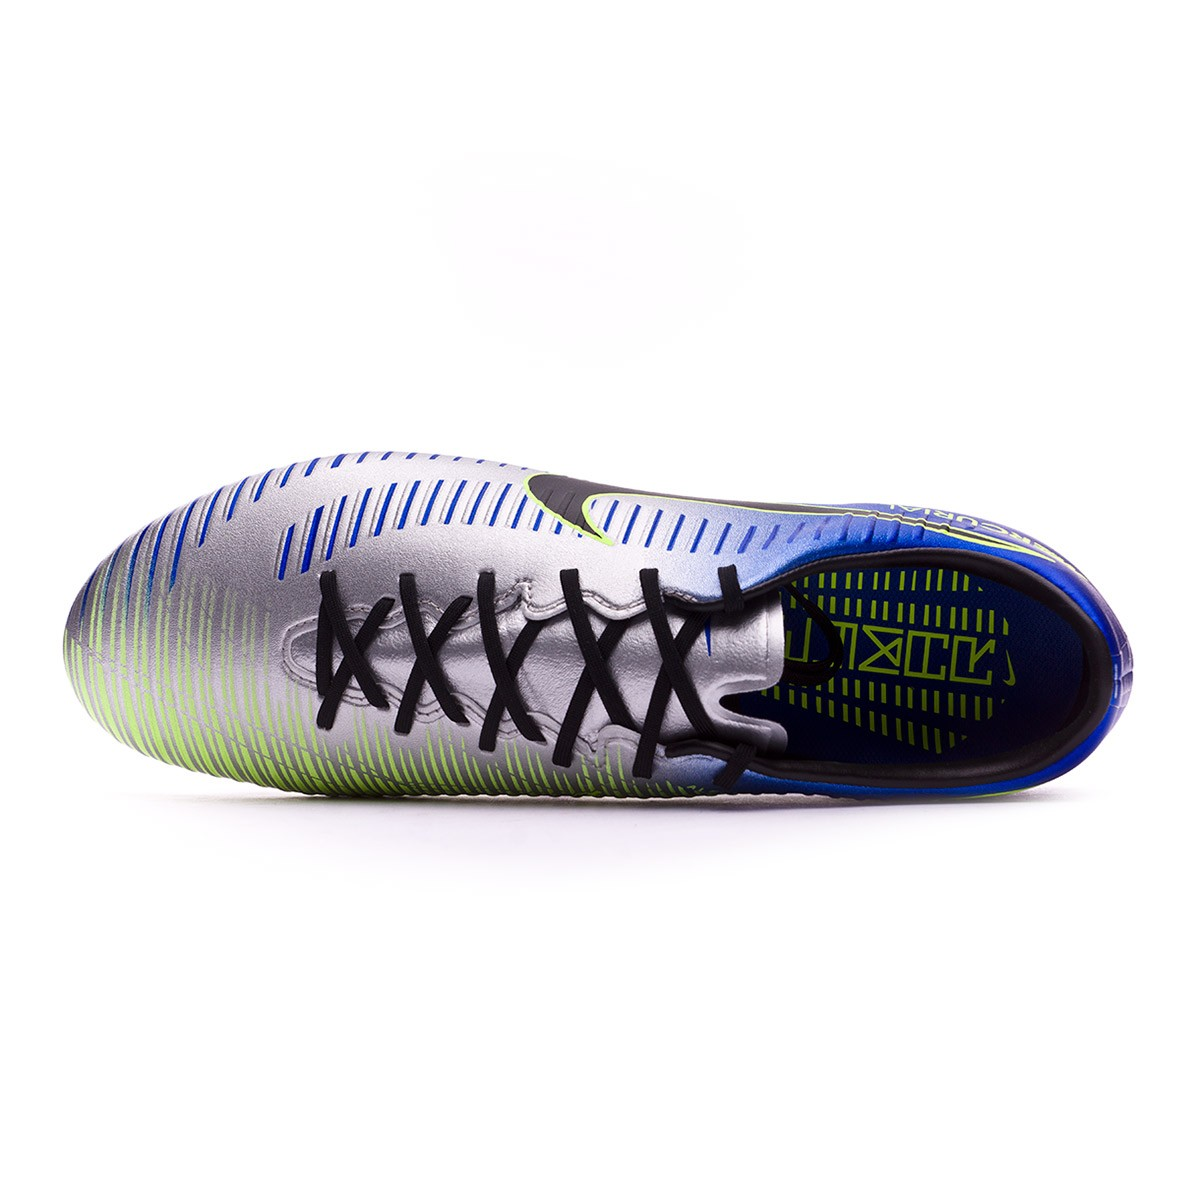 6dc47651753 Football Boots Nike Mercurial Veloce III FG Neymar Racer blue-Black-Chrome- Volt - Tienda de fútbol Fútbol Emotion